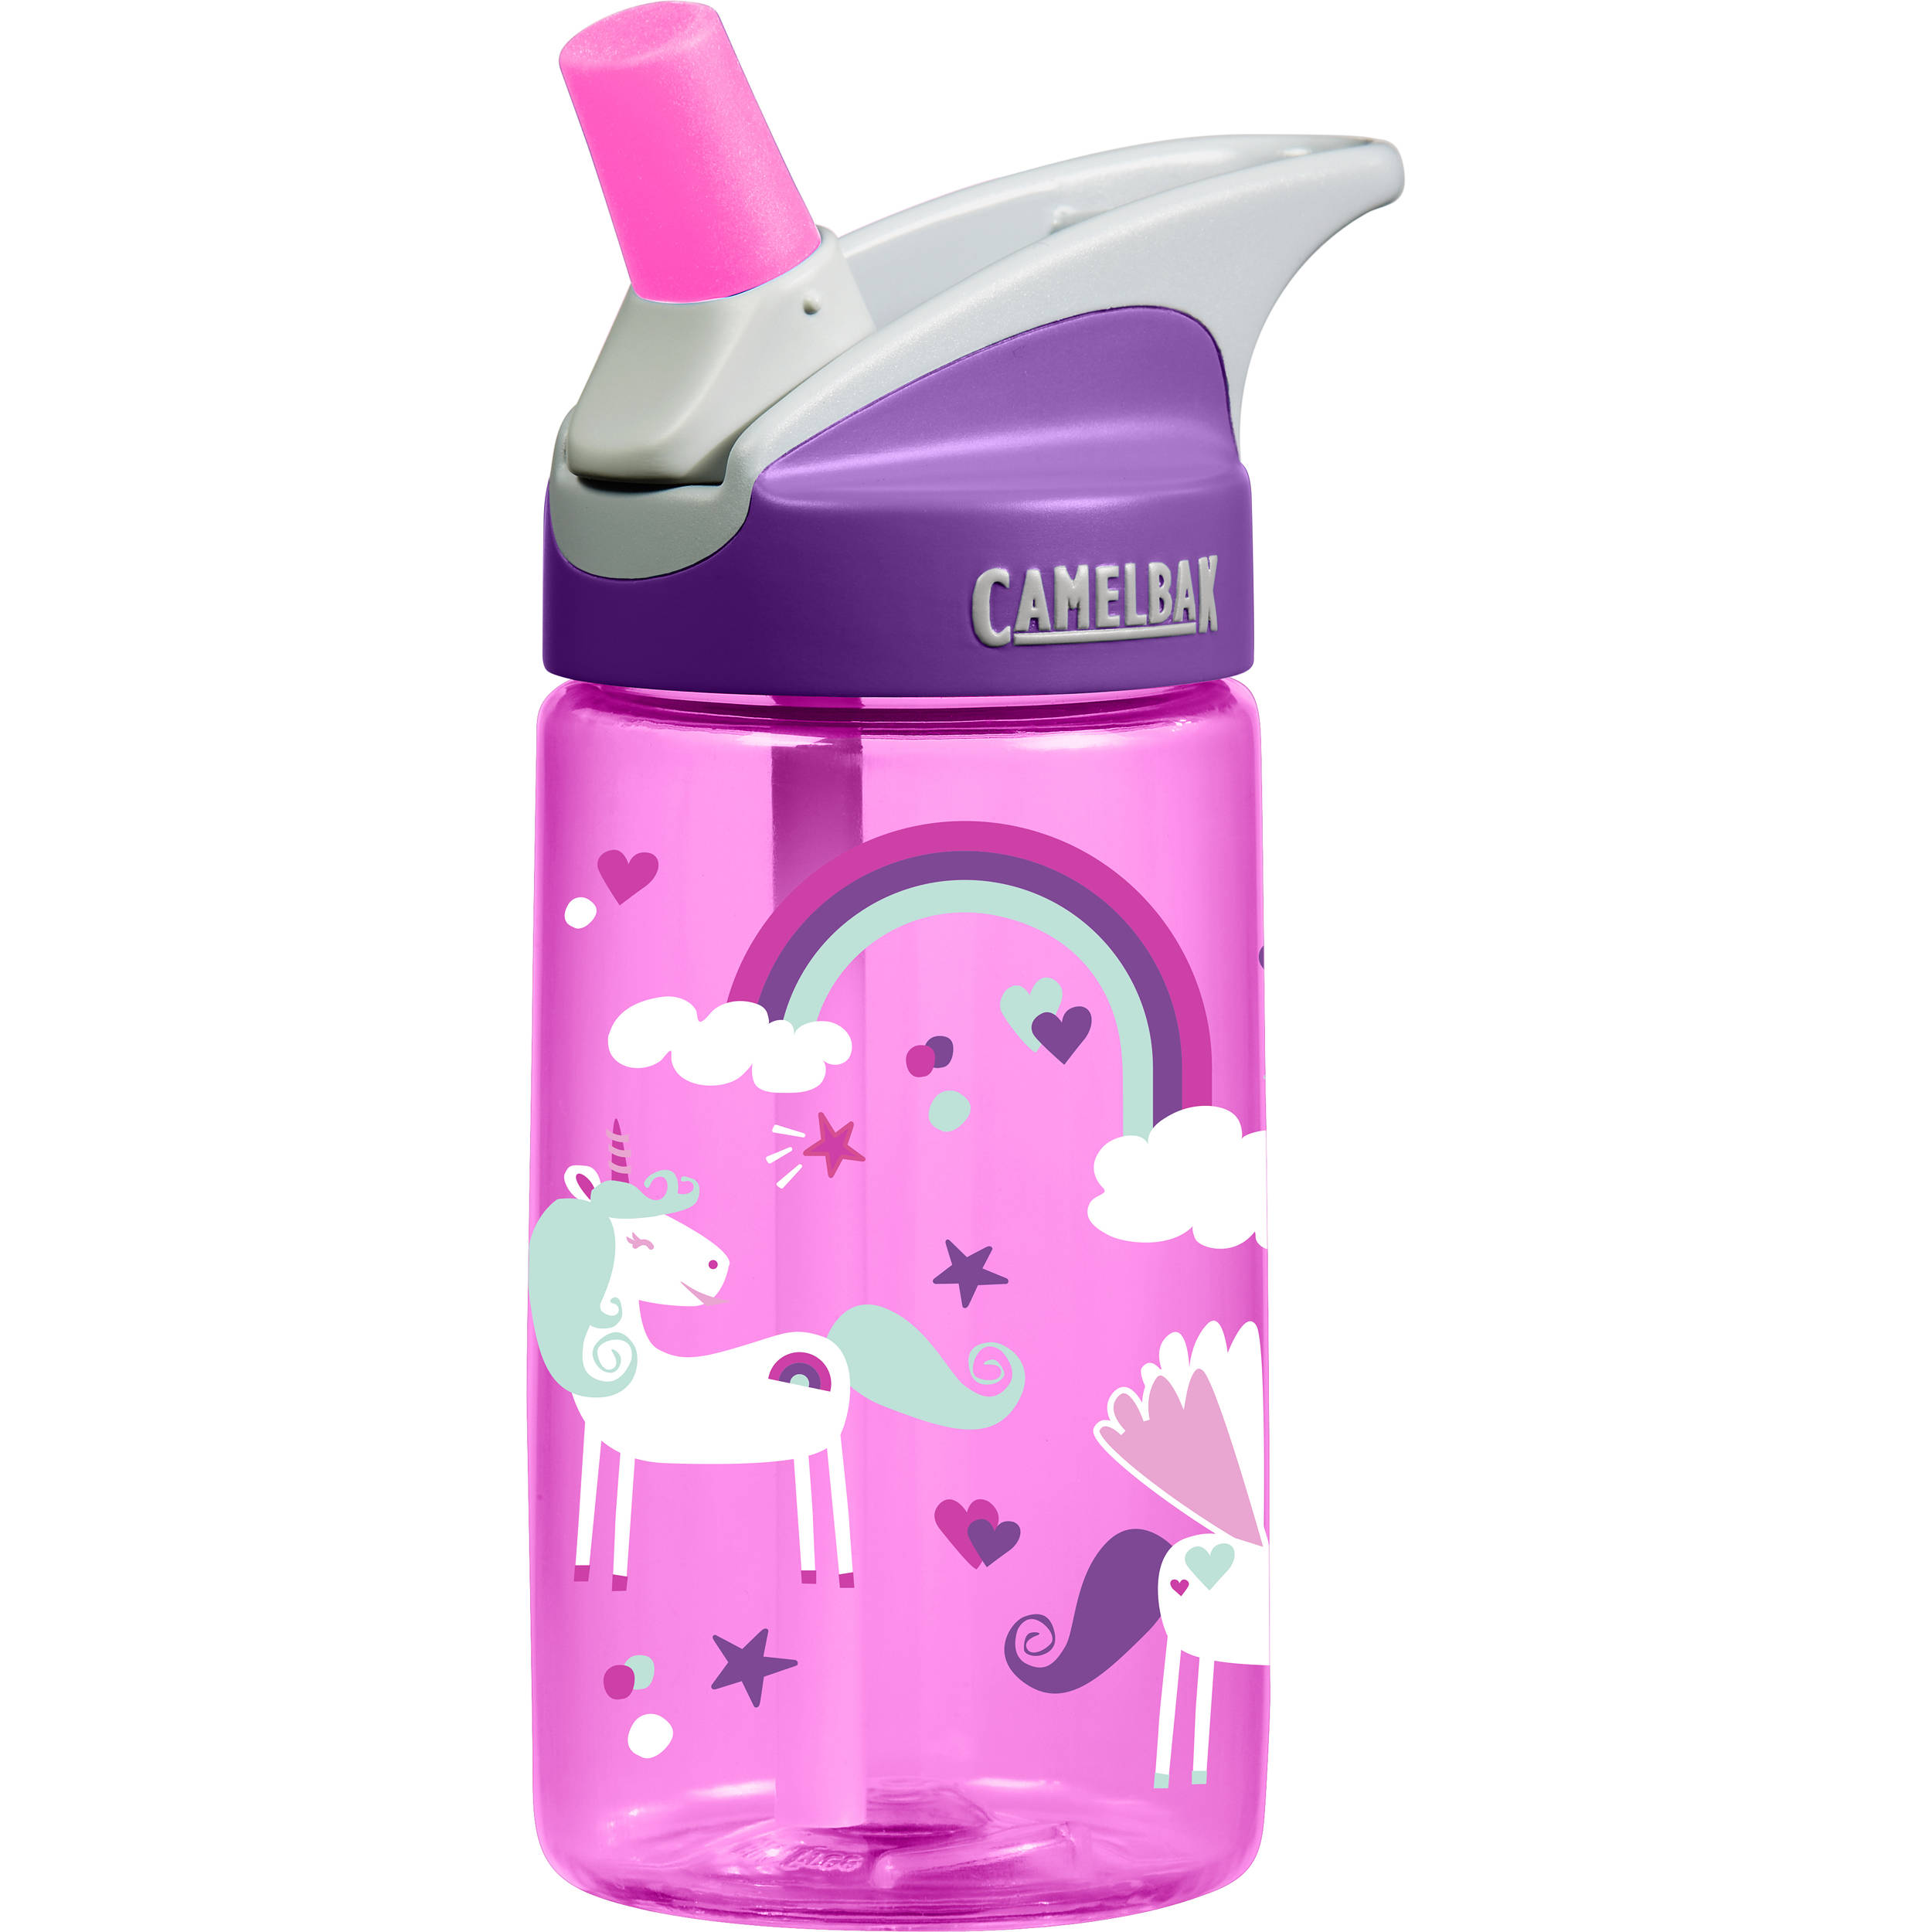 Pink Camelbak Drink Bottle